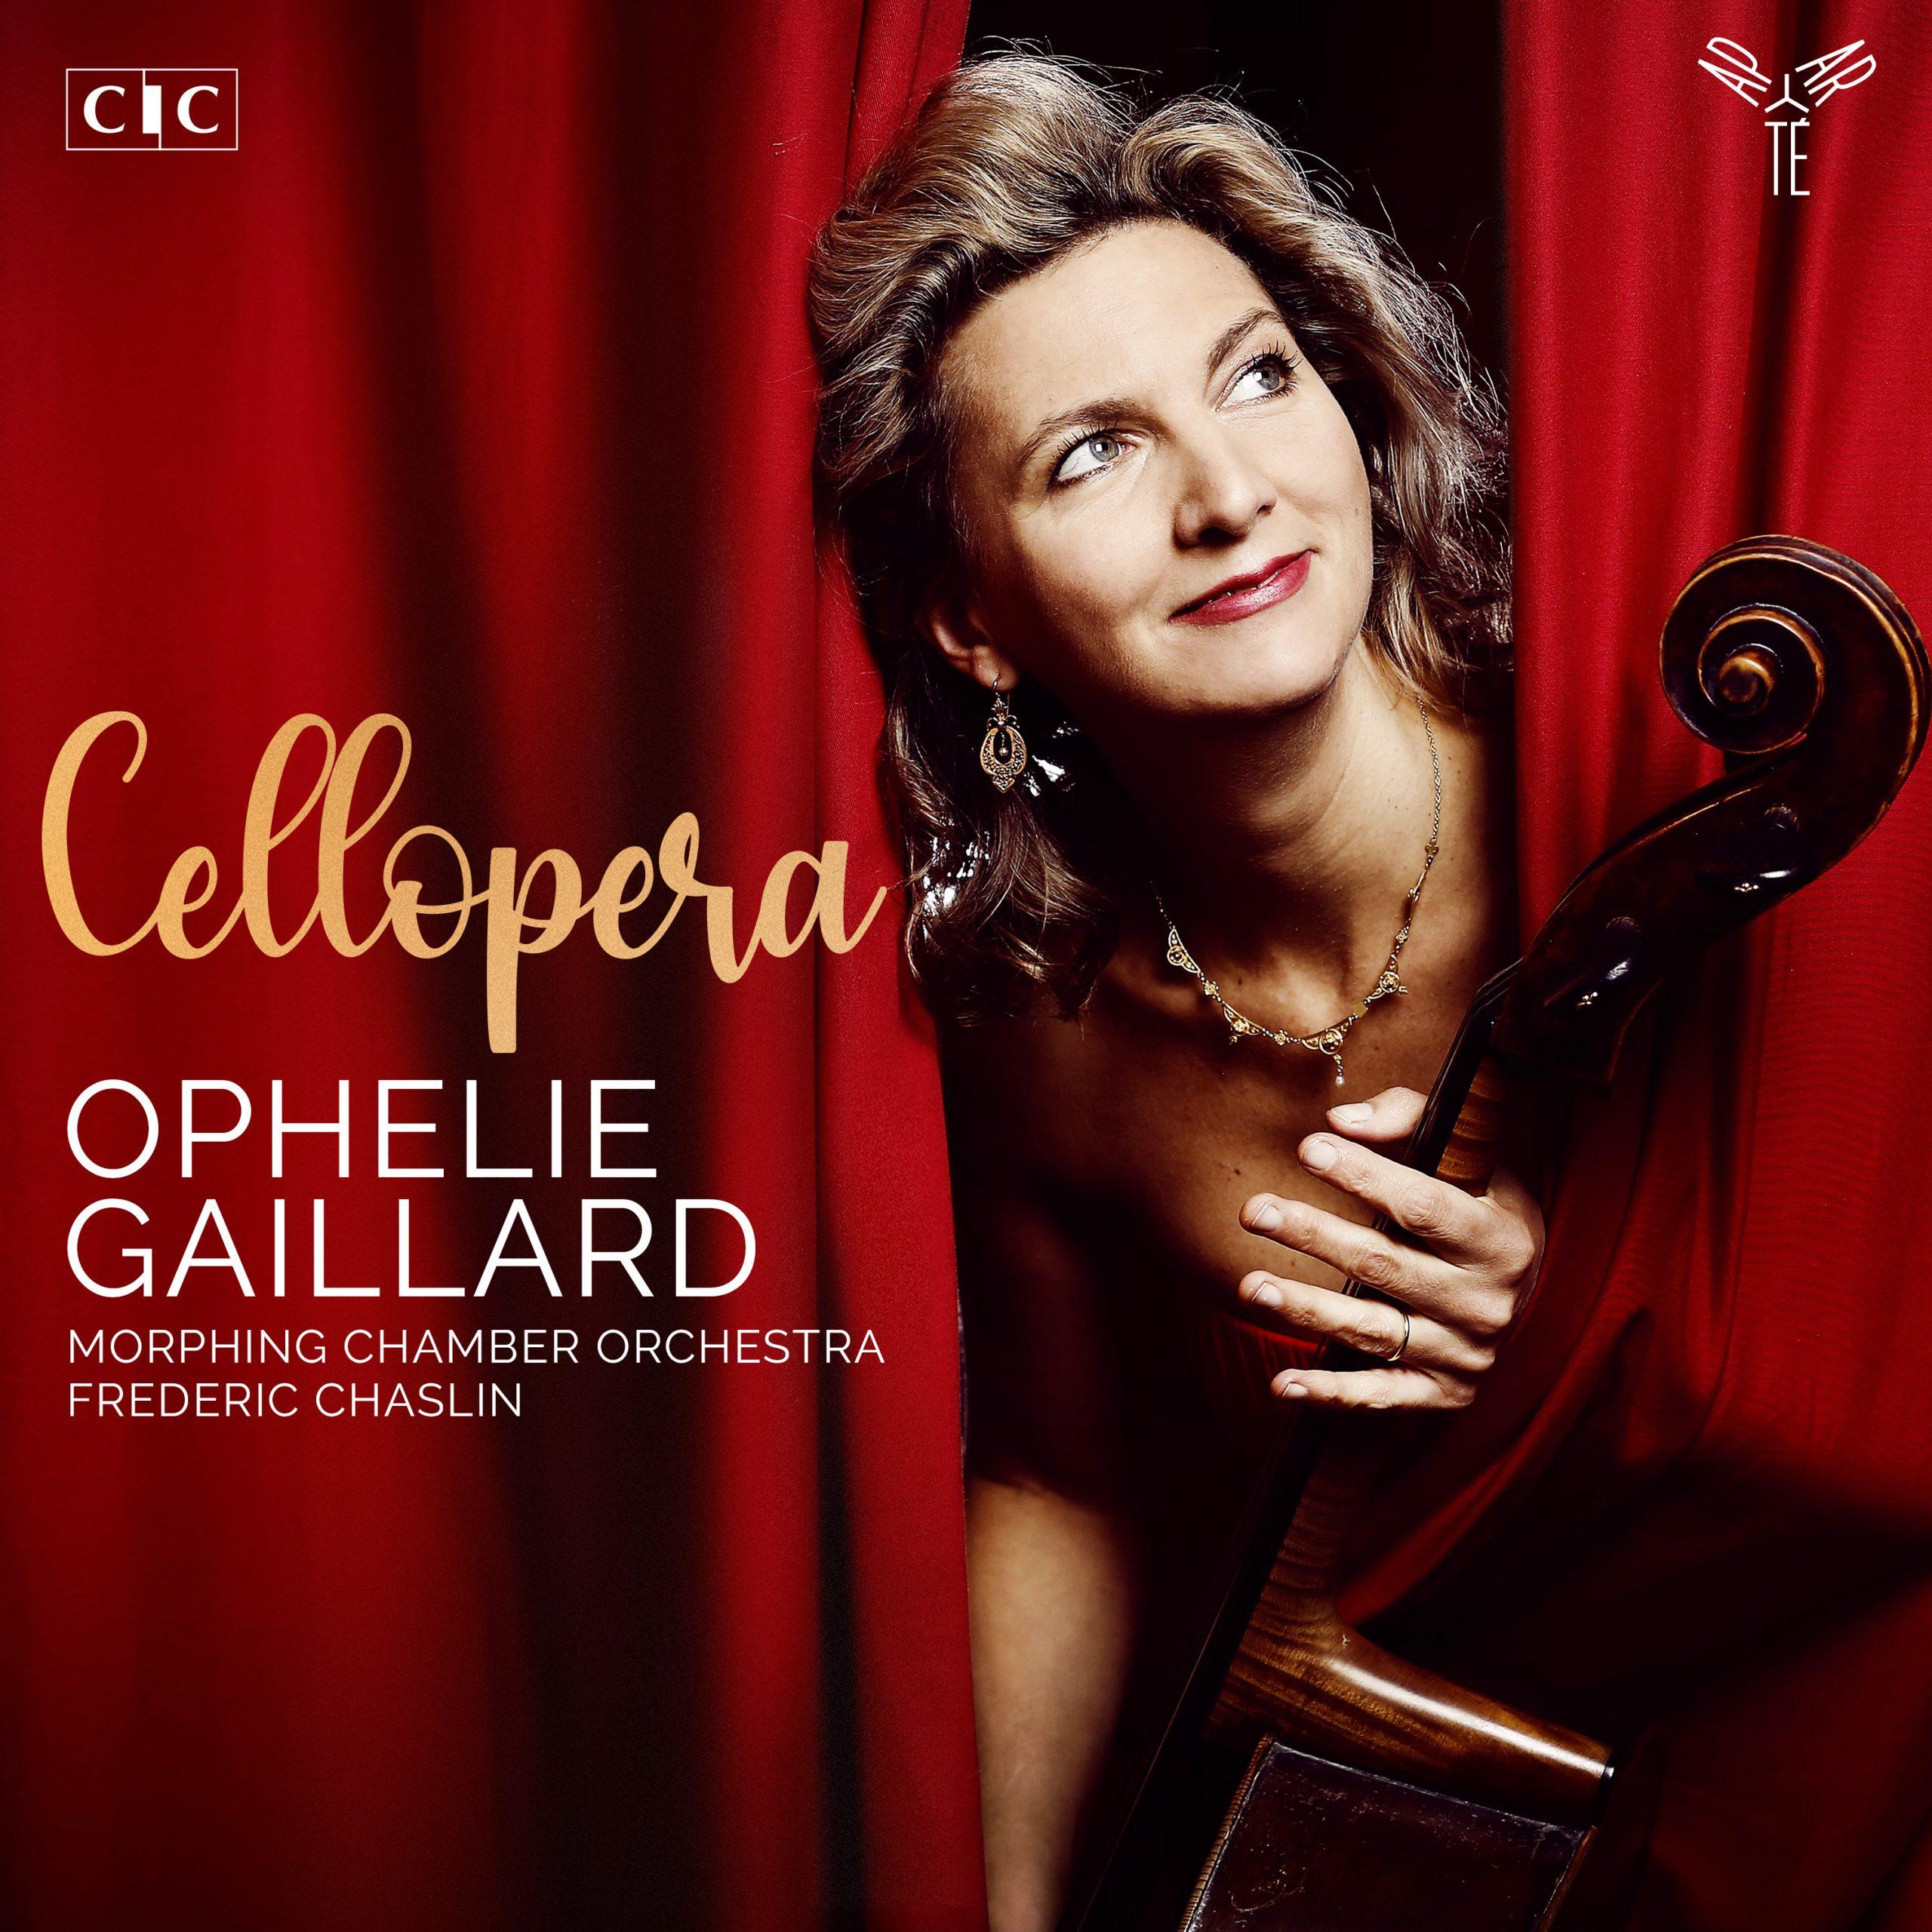 Cellopera